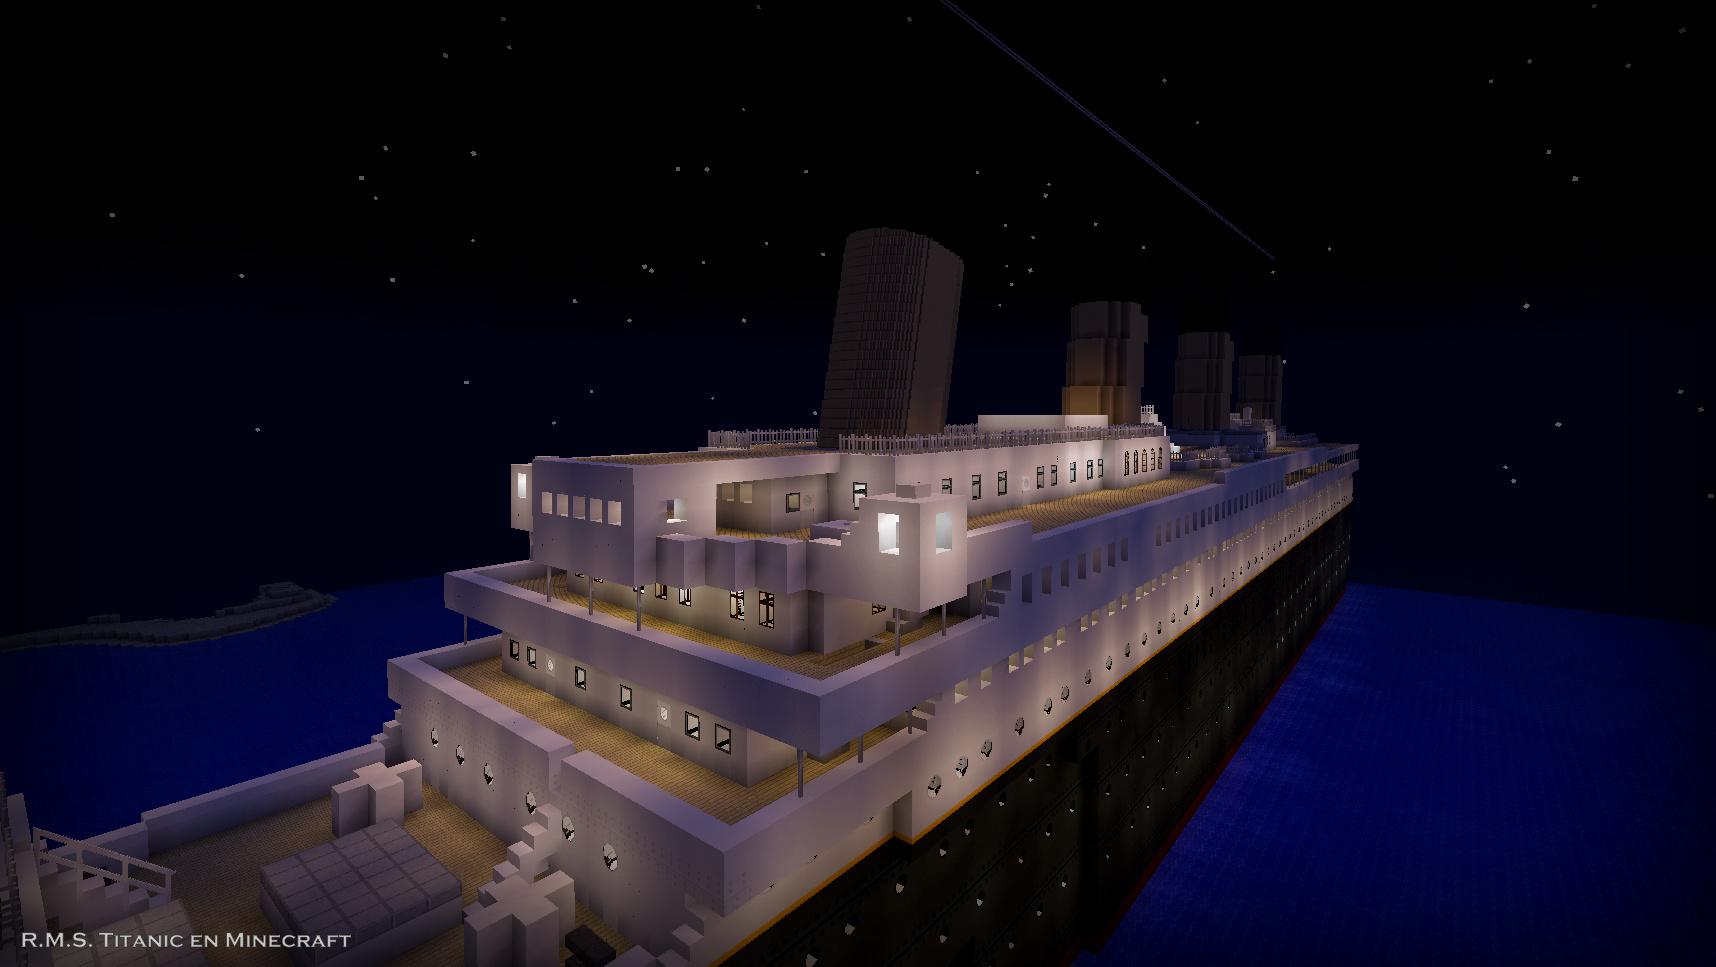 Most Amazing Minecraft Builds